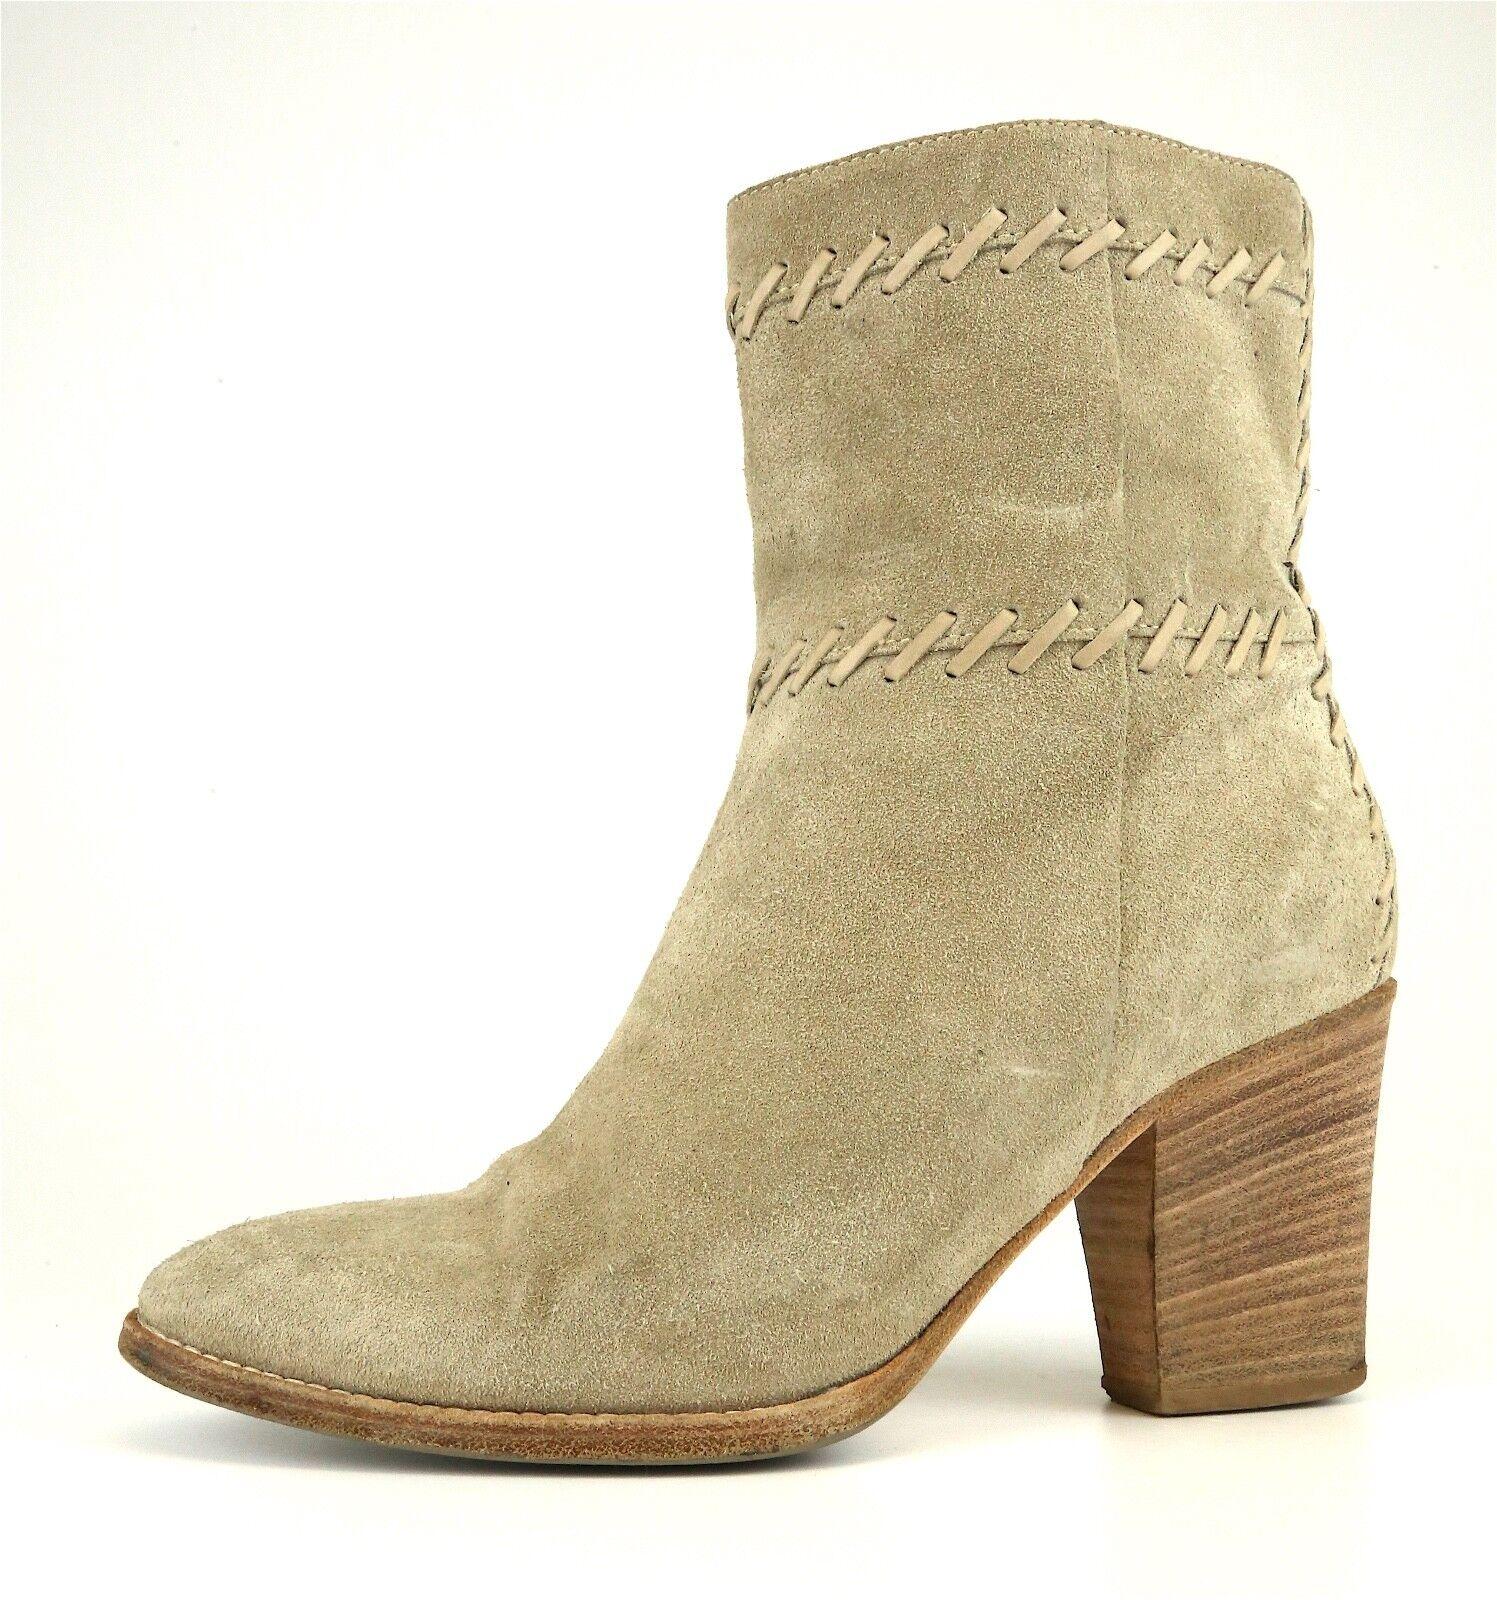 Aquatalia By Marvin K. Side Zip Suede Ankle Boots Beige Women Sz 8.5 5134 *